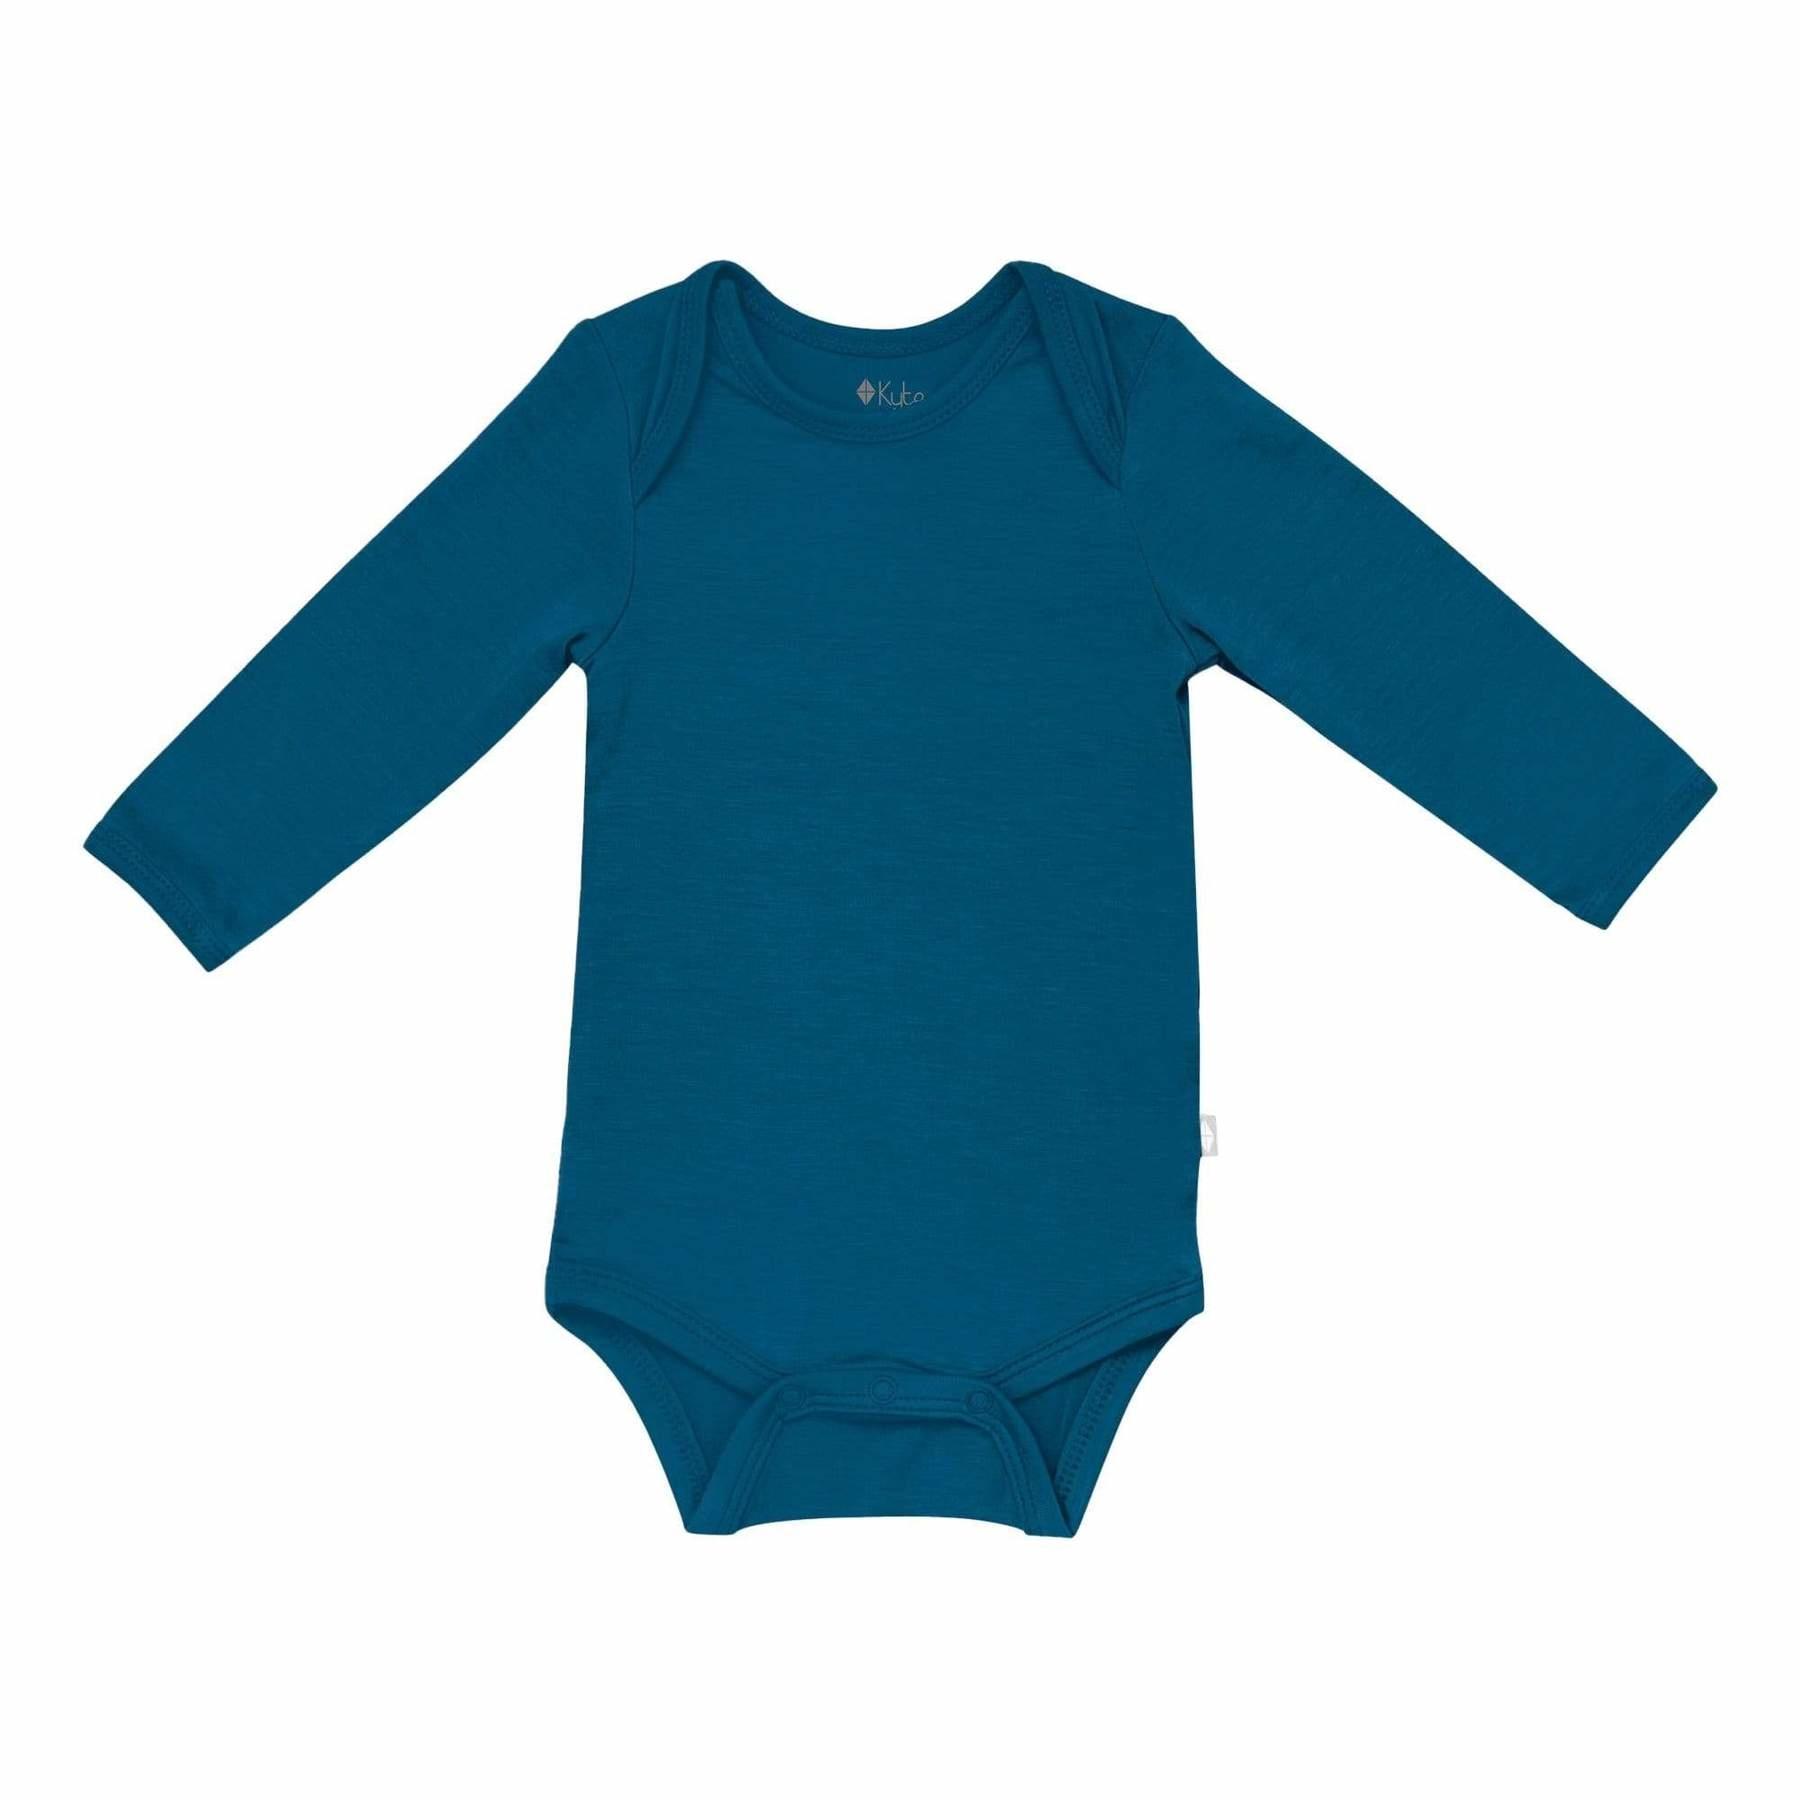 Kyte Baby Kyte Baby Long Sleeve Bodysuit - Baltic